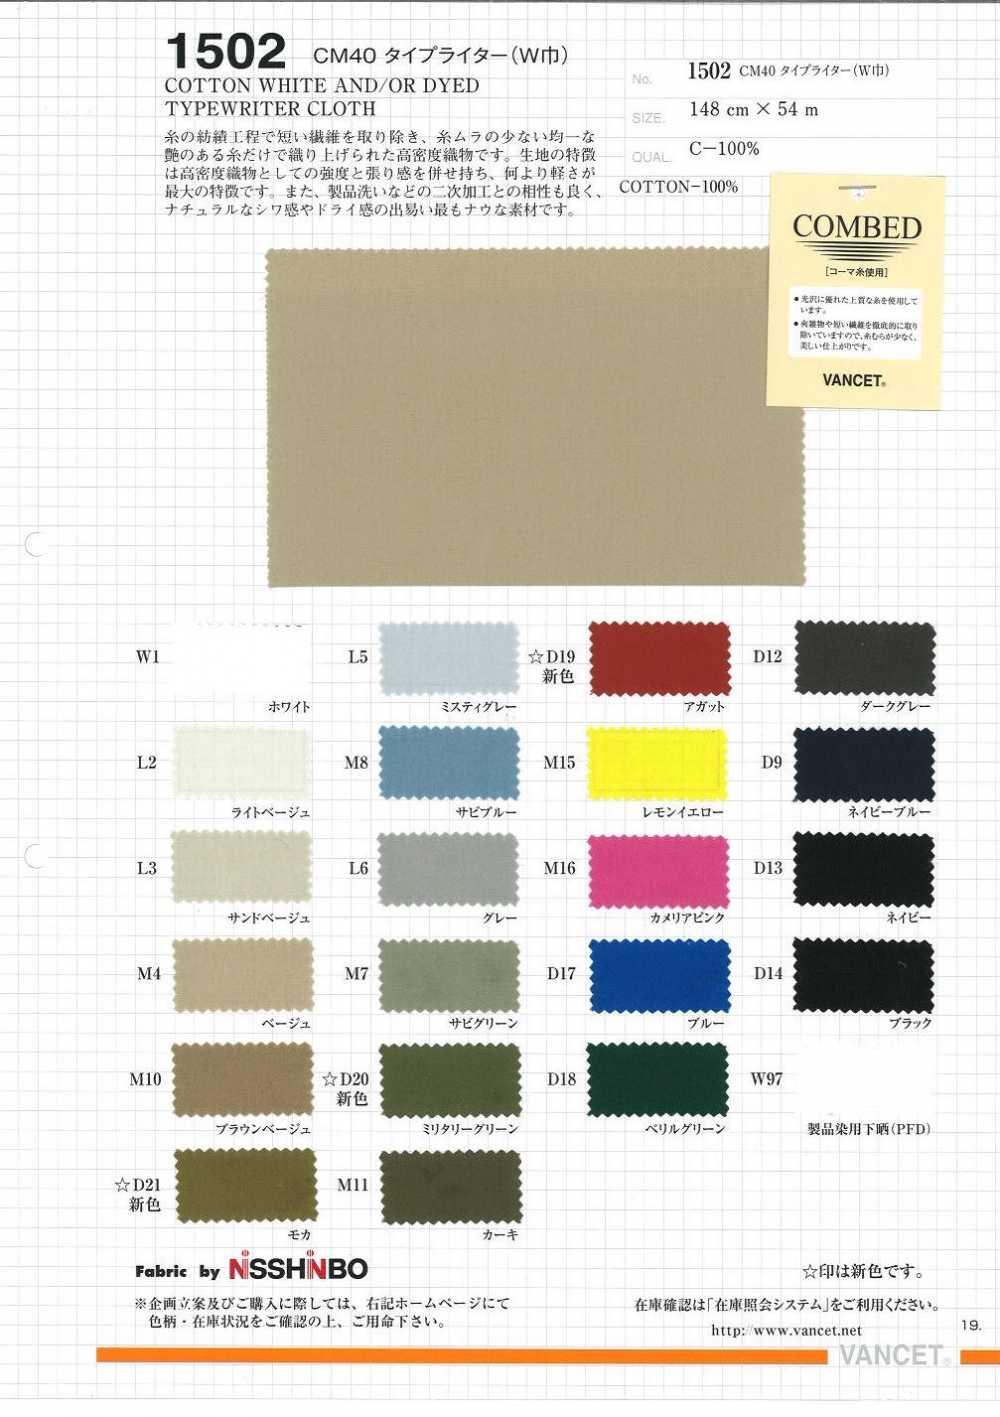 1502 CM40 タイプライター(W巾)[生地] VANCET/オークラ商事 - ApparelX アパレル資材卸通販